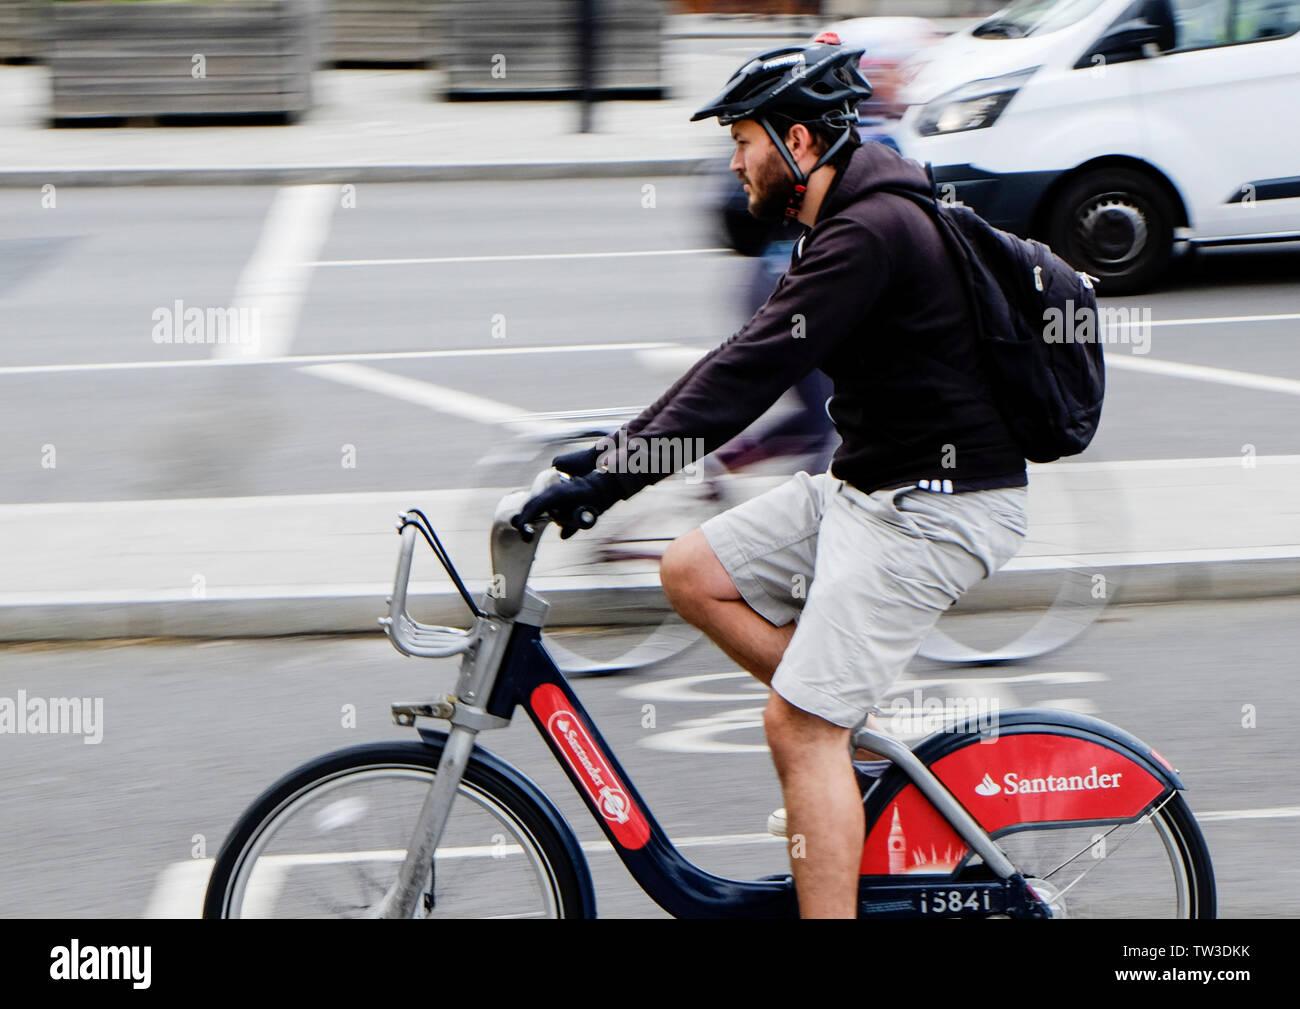 Motion blur capture of a male cyclist on a Santander bike in a cycle lane leaving Blackfriars Bridge, London - Stock Image